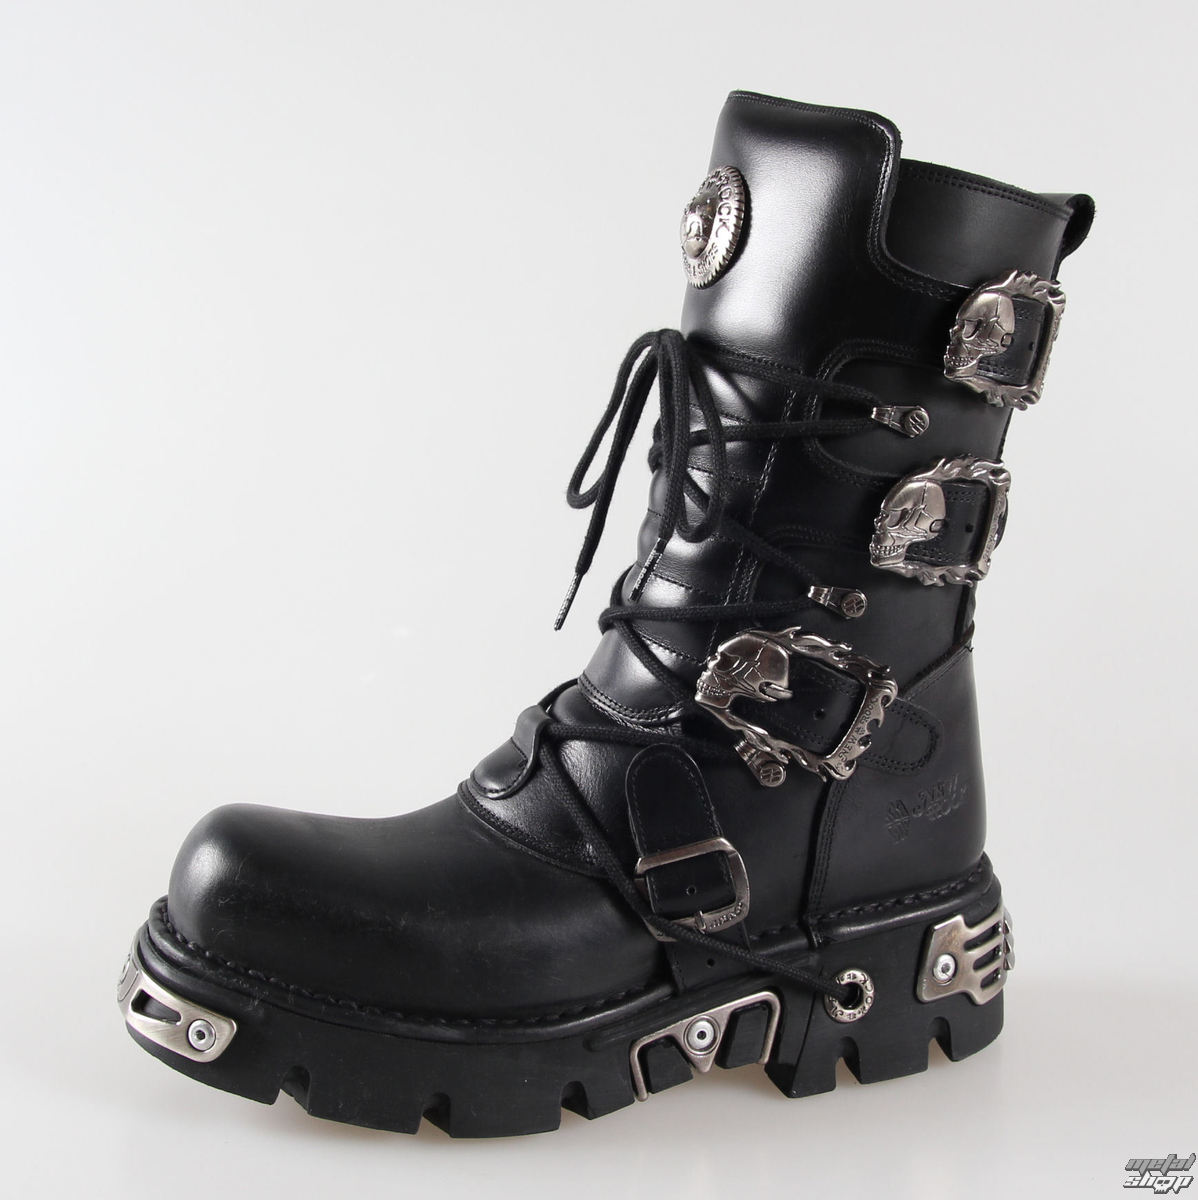 b918feacd09 Boty New rock - Metal Boots (391-S1) Black - metalshop.cz